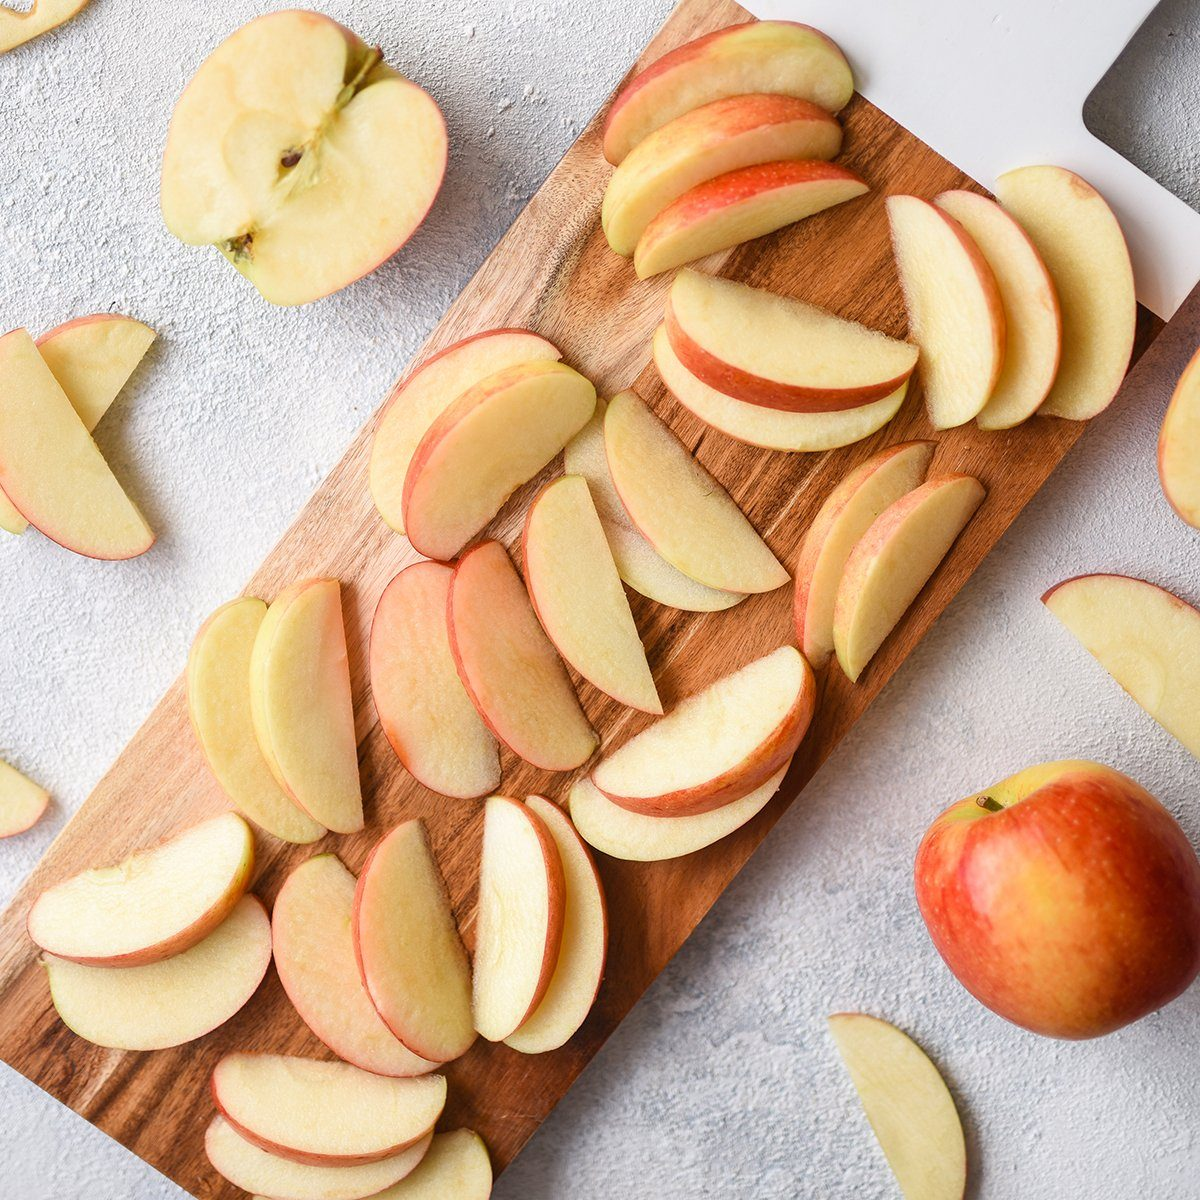 Sliced Apples on a Wooden Chopping Board; Shutterstock ID 1370470283; Job (TFH, TOH, RD, BNB, CWM, CM): TOH